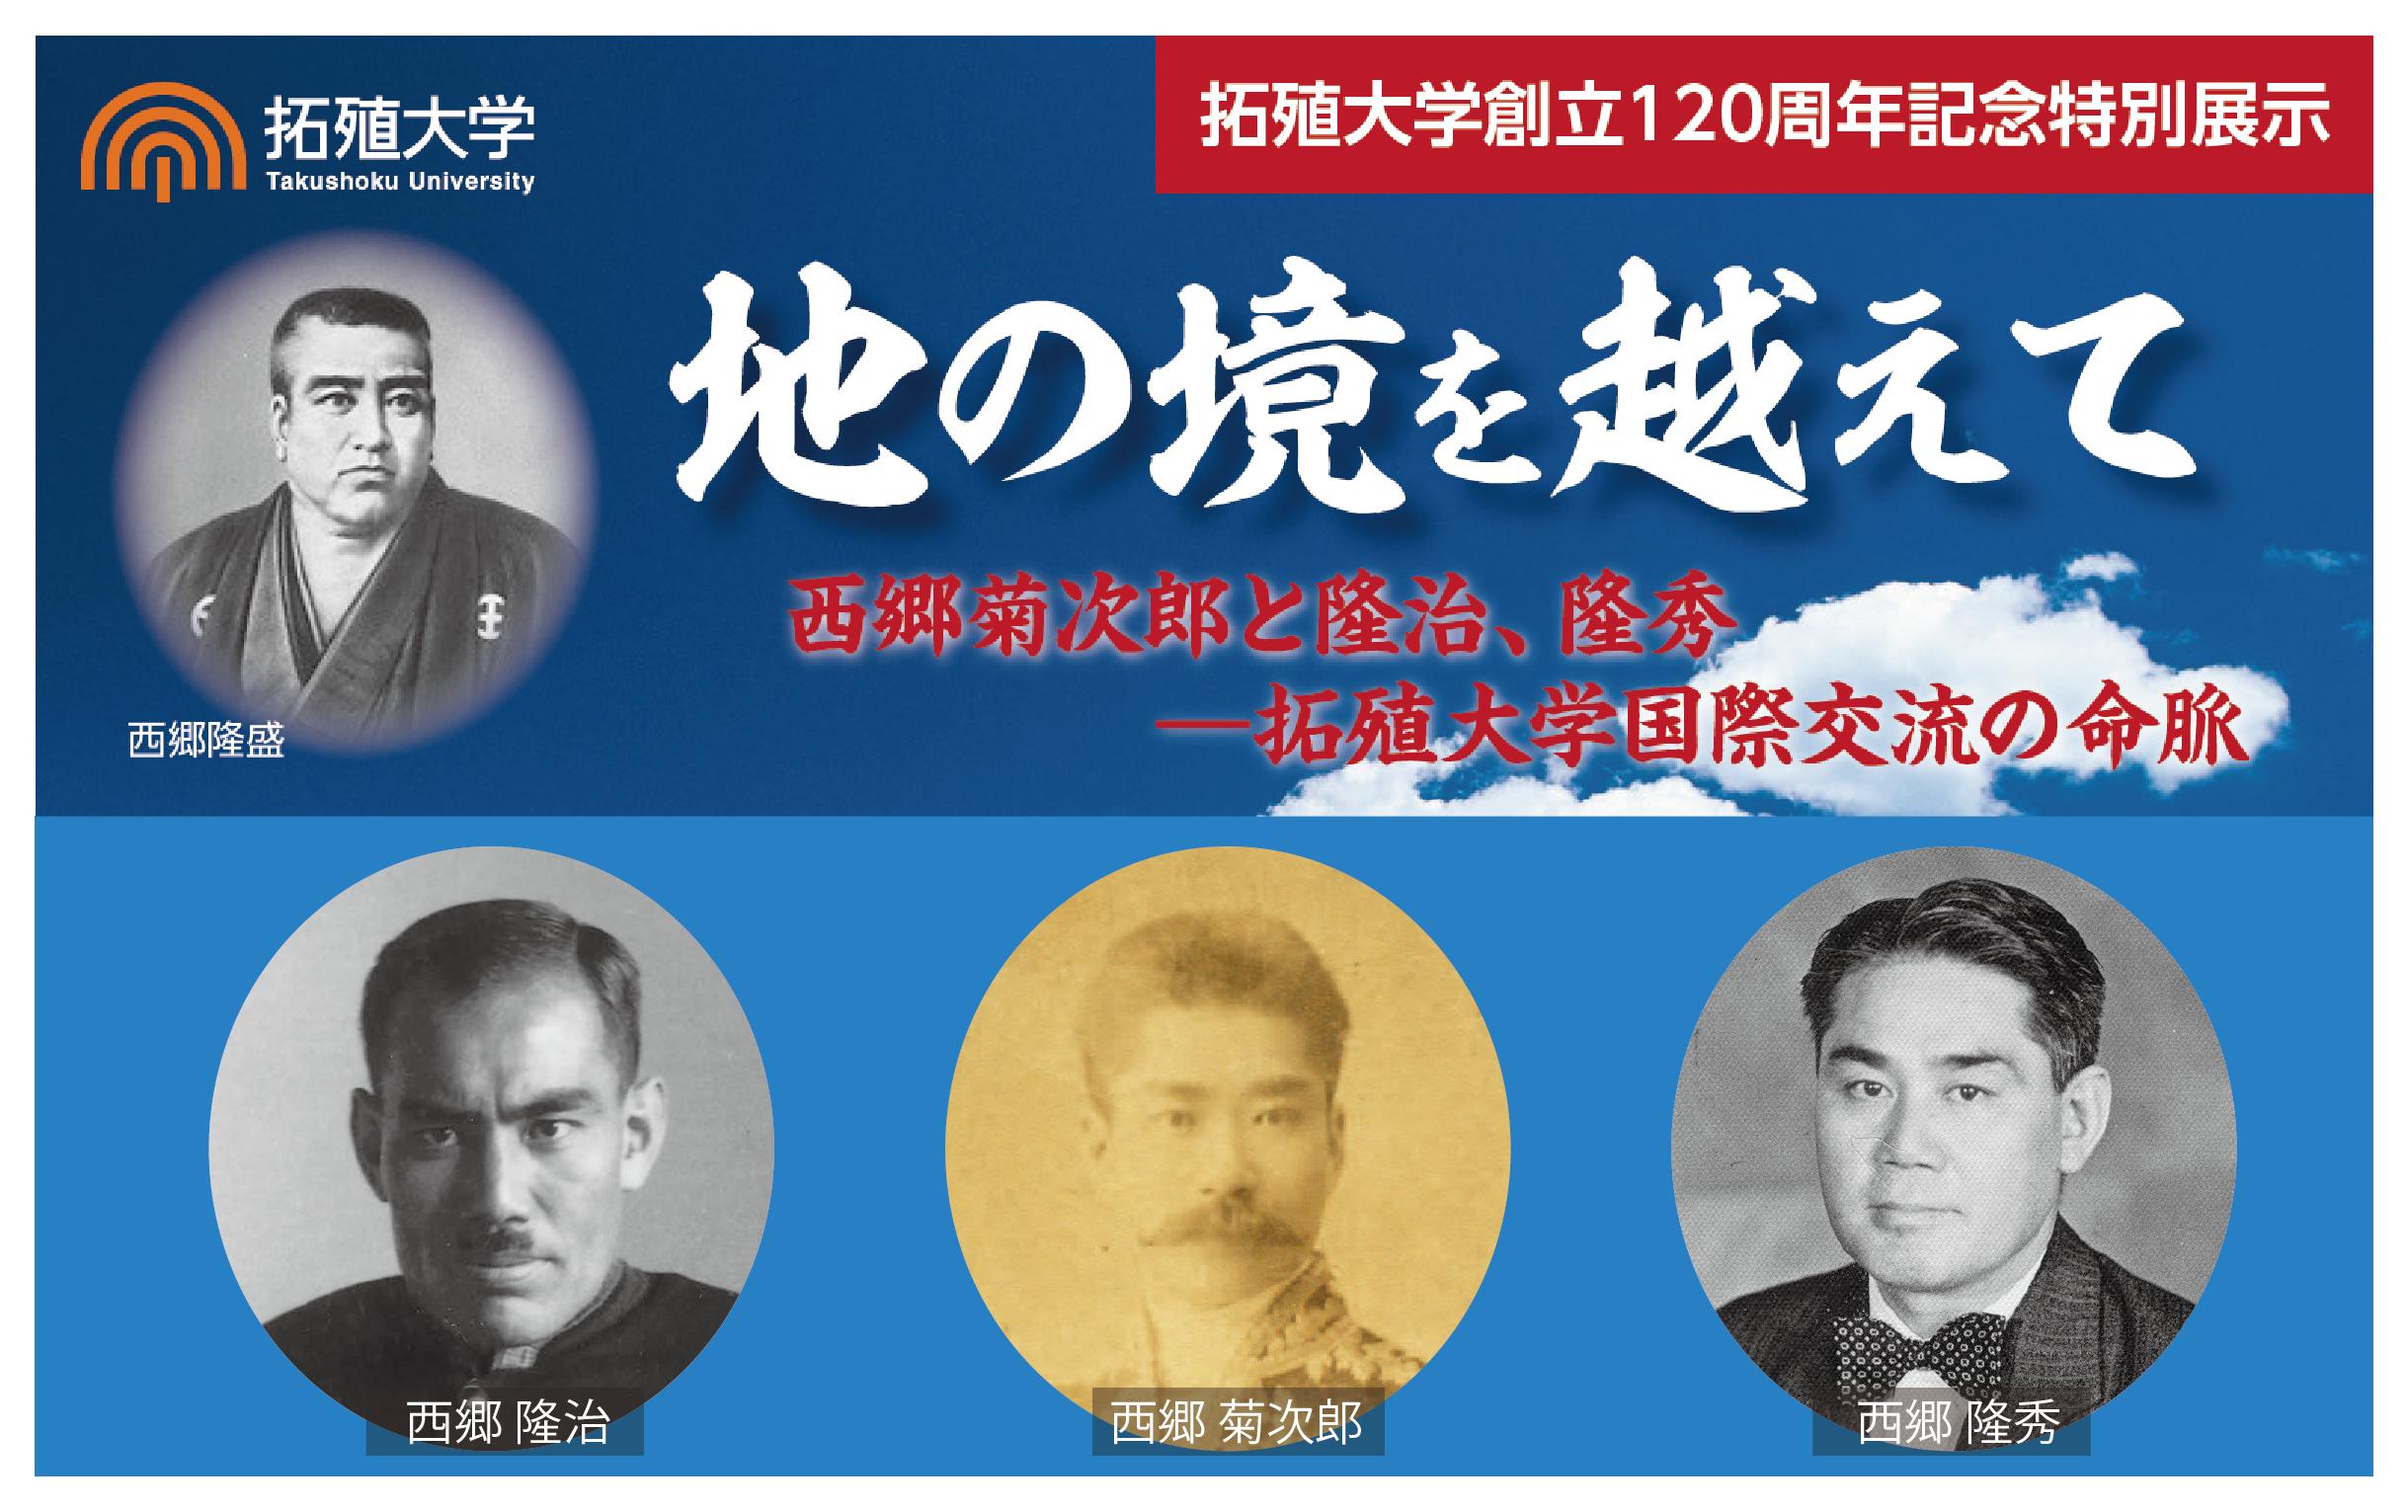 拓殖大学創立120周年記念特別展示「地の境を越えて」西郷菊次郎と隆治、隆秀 -- 拓殖大学国際交流の命脈